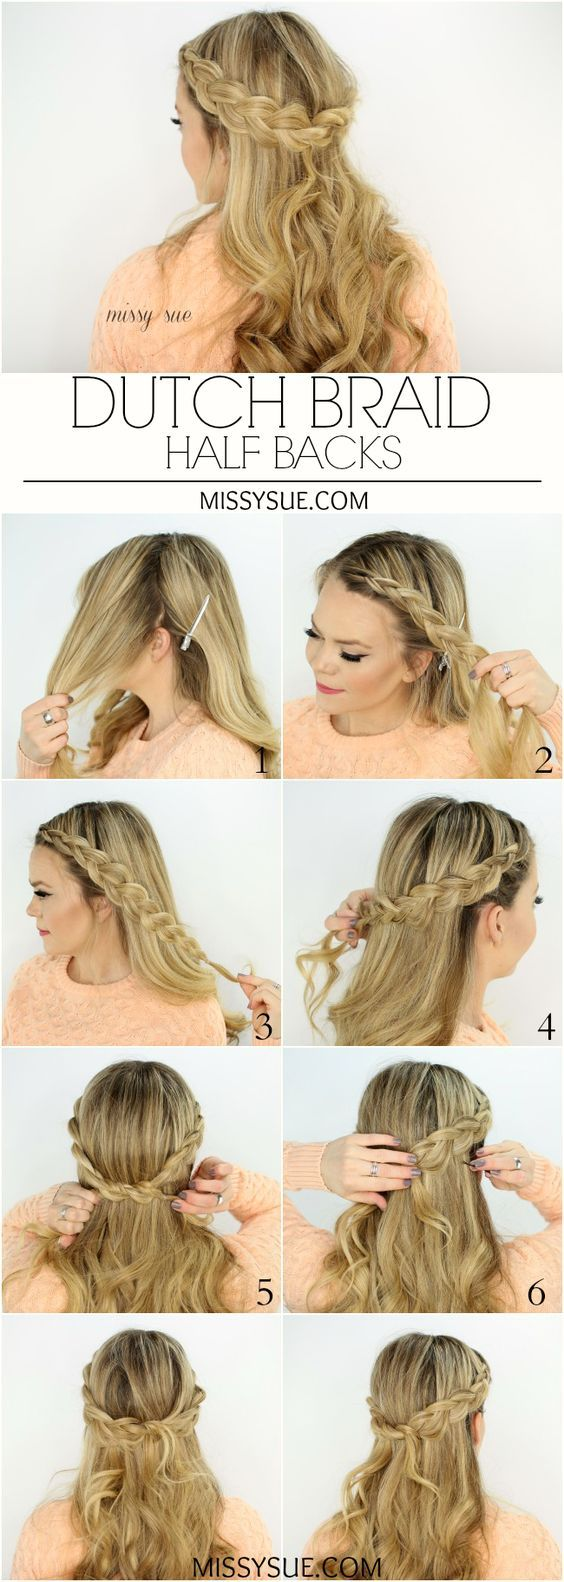 Peinados ideas para el cabello pinterest prom hair updo and